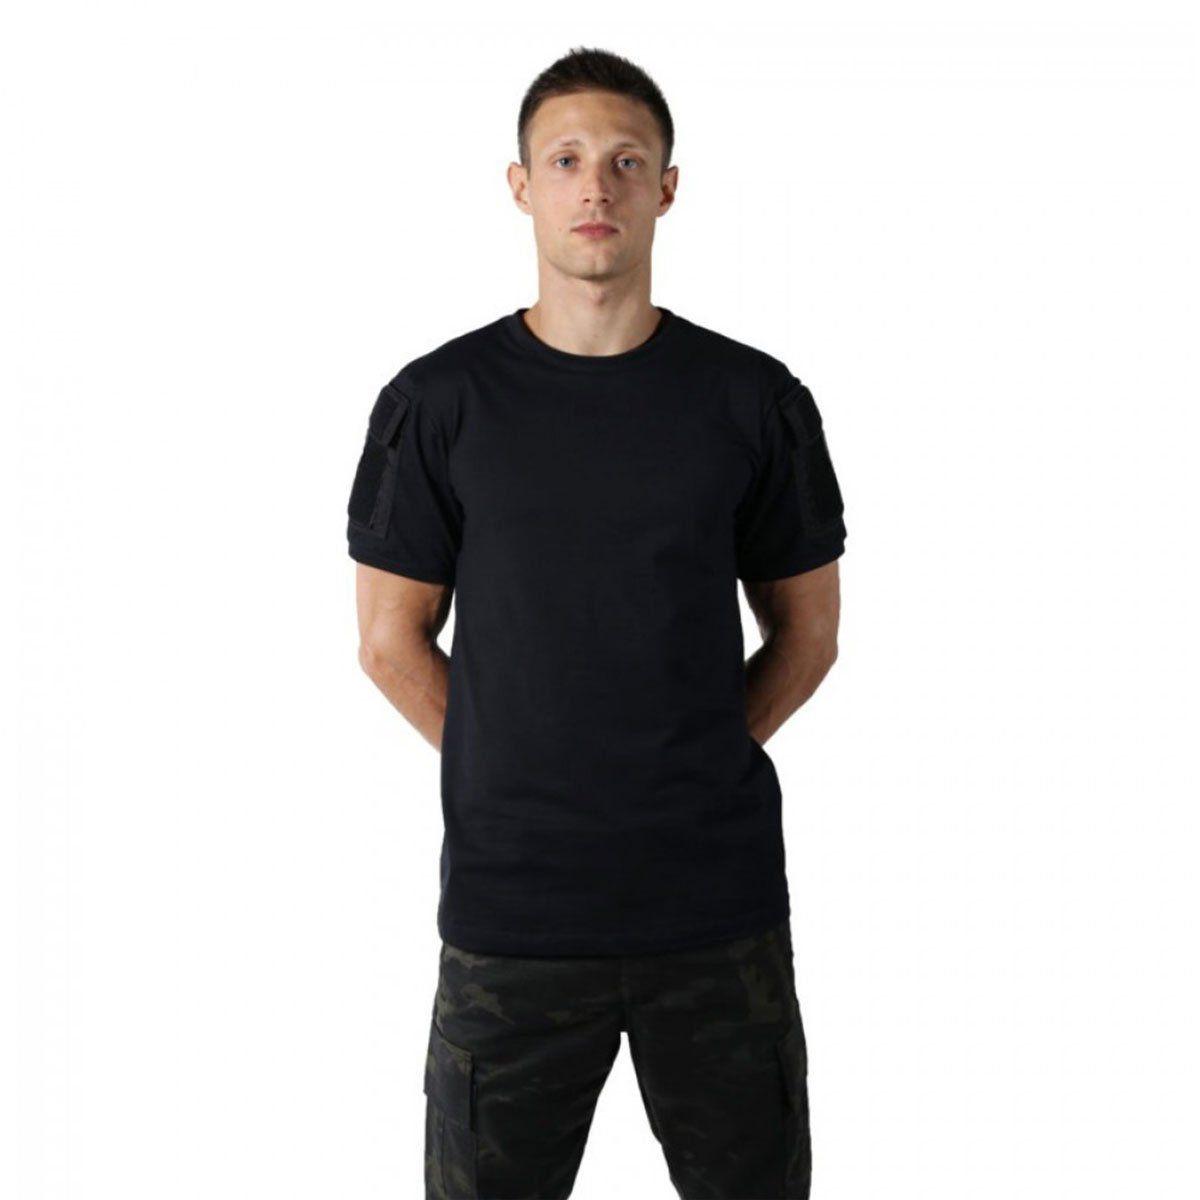 Camiseta Masculina Belica Ranger 4-Preto